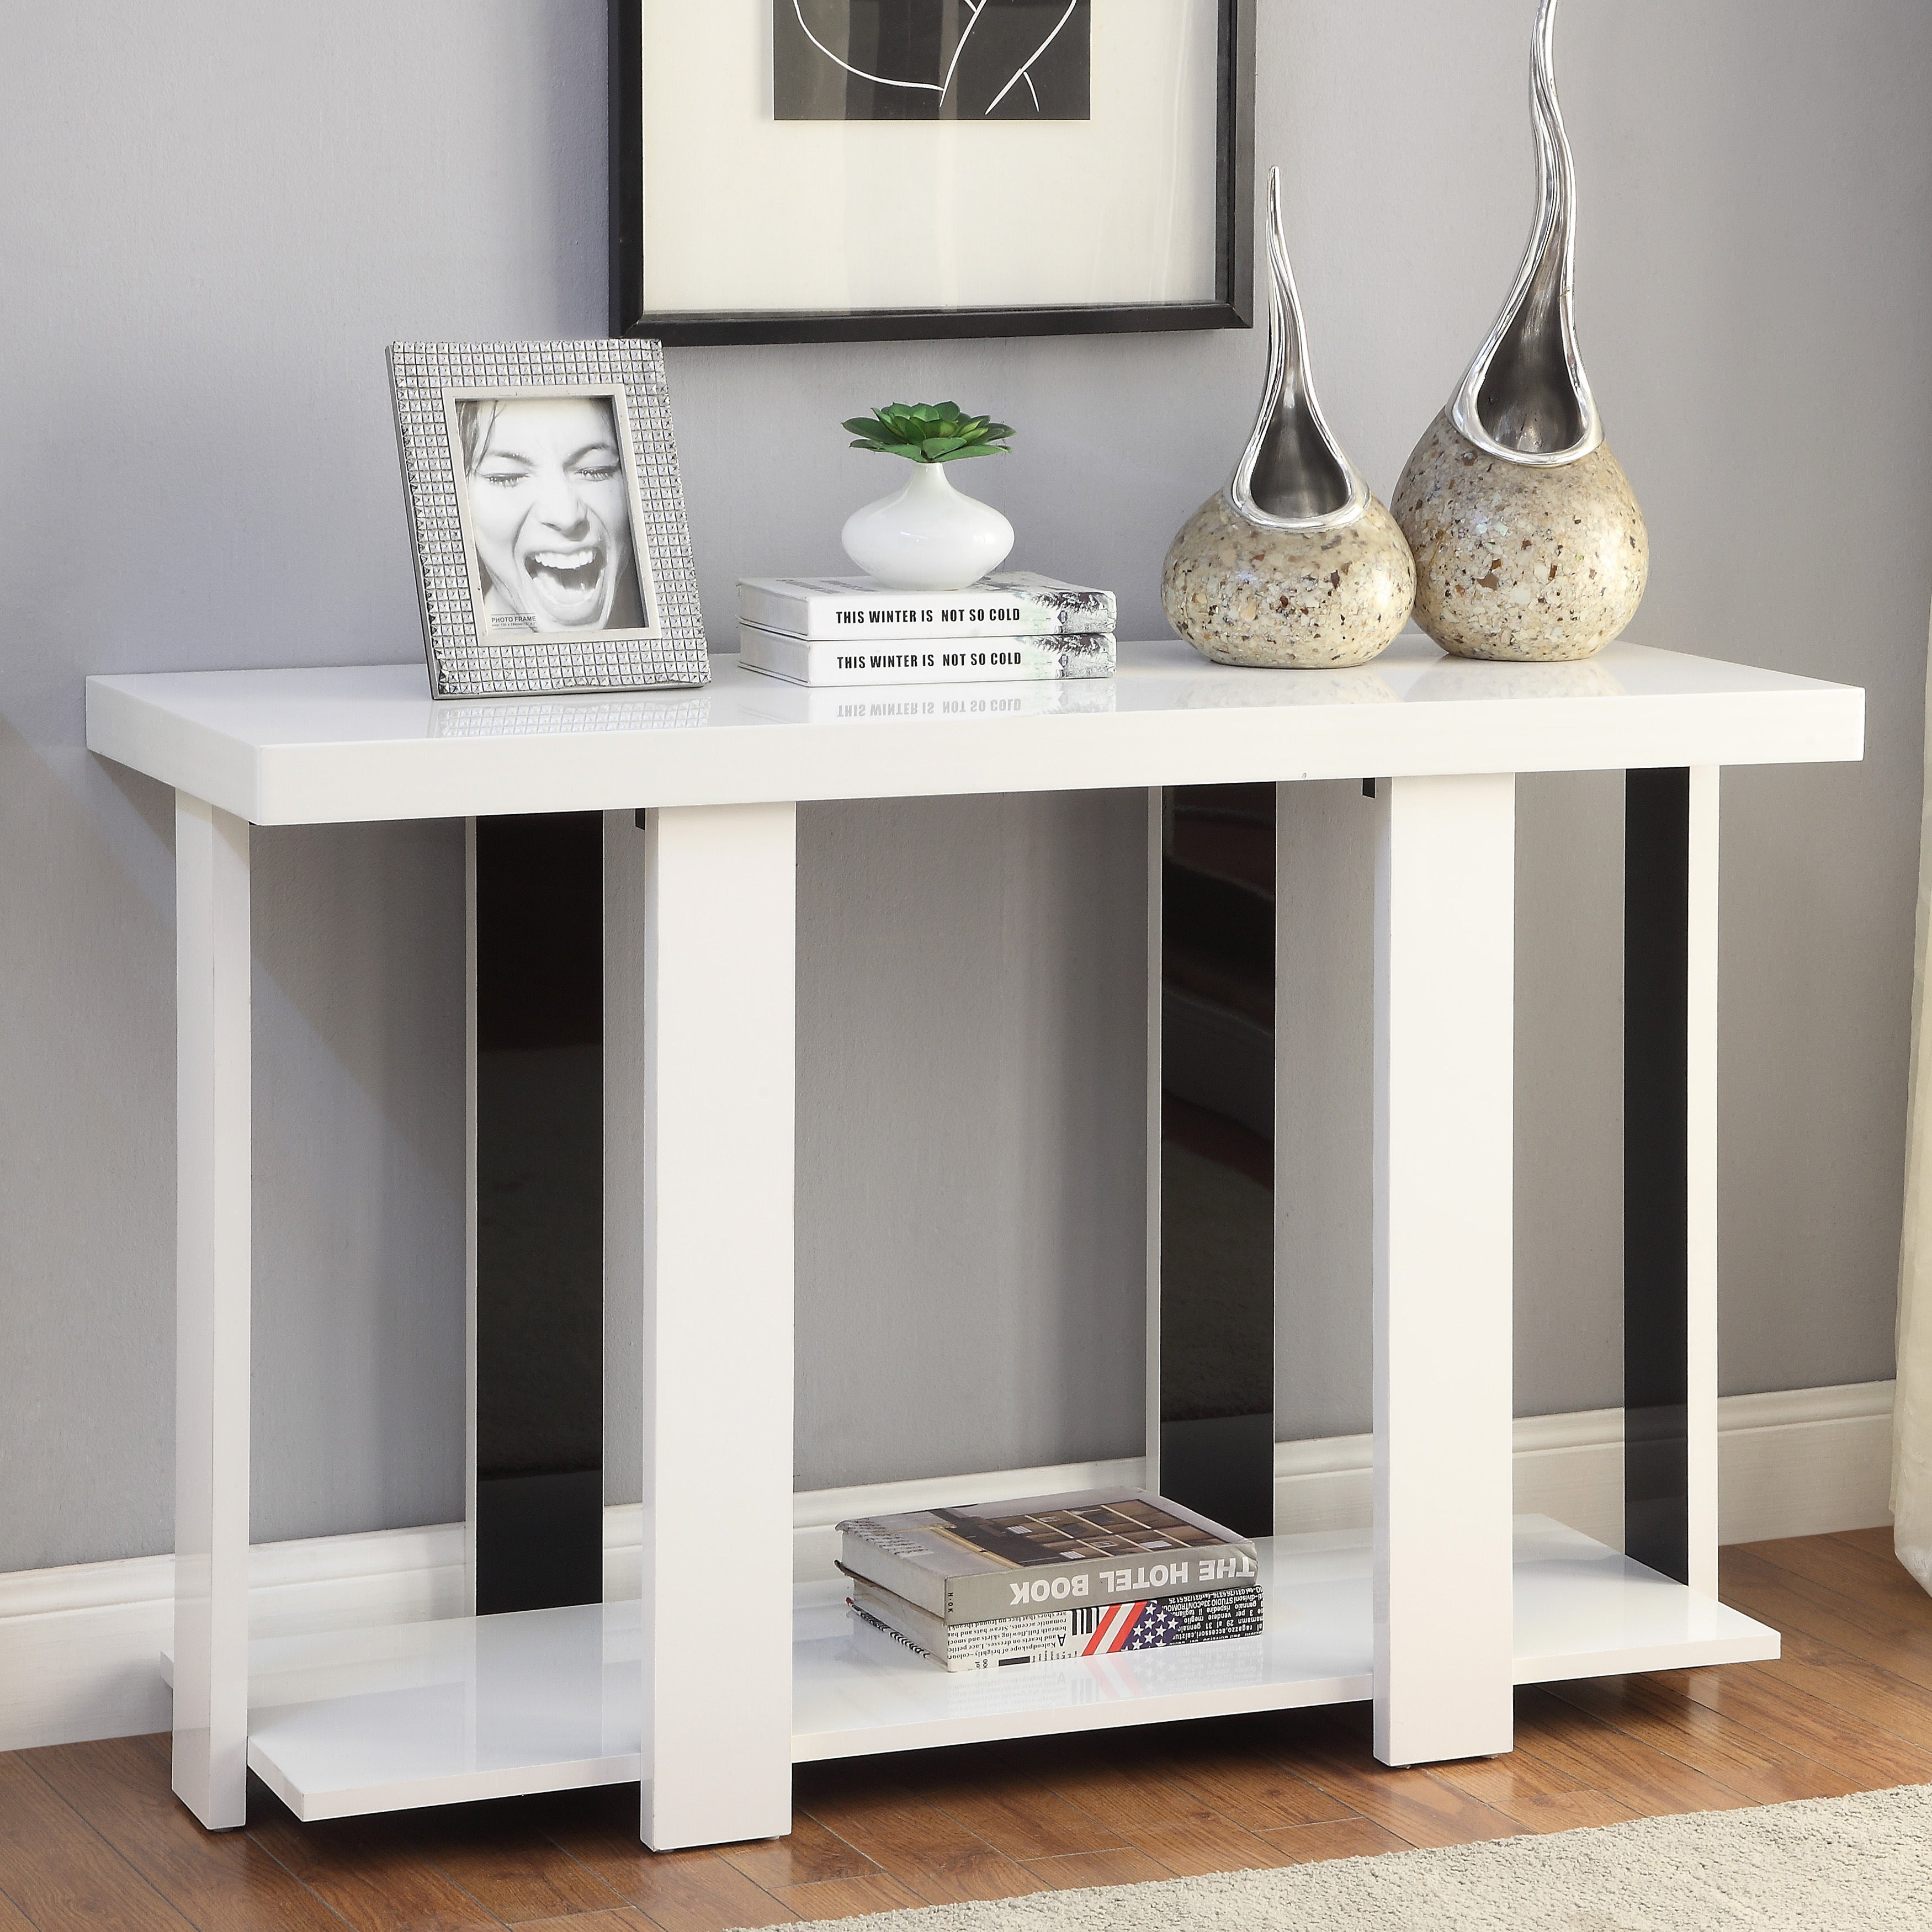 Furniture of america kennin modern high gloss two tone sofa table